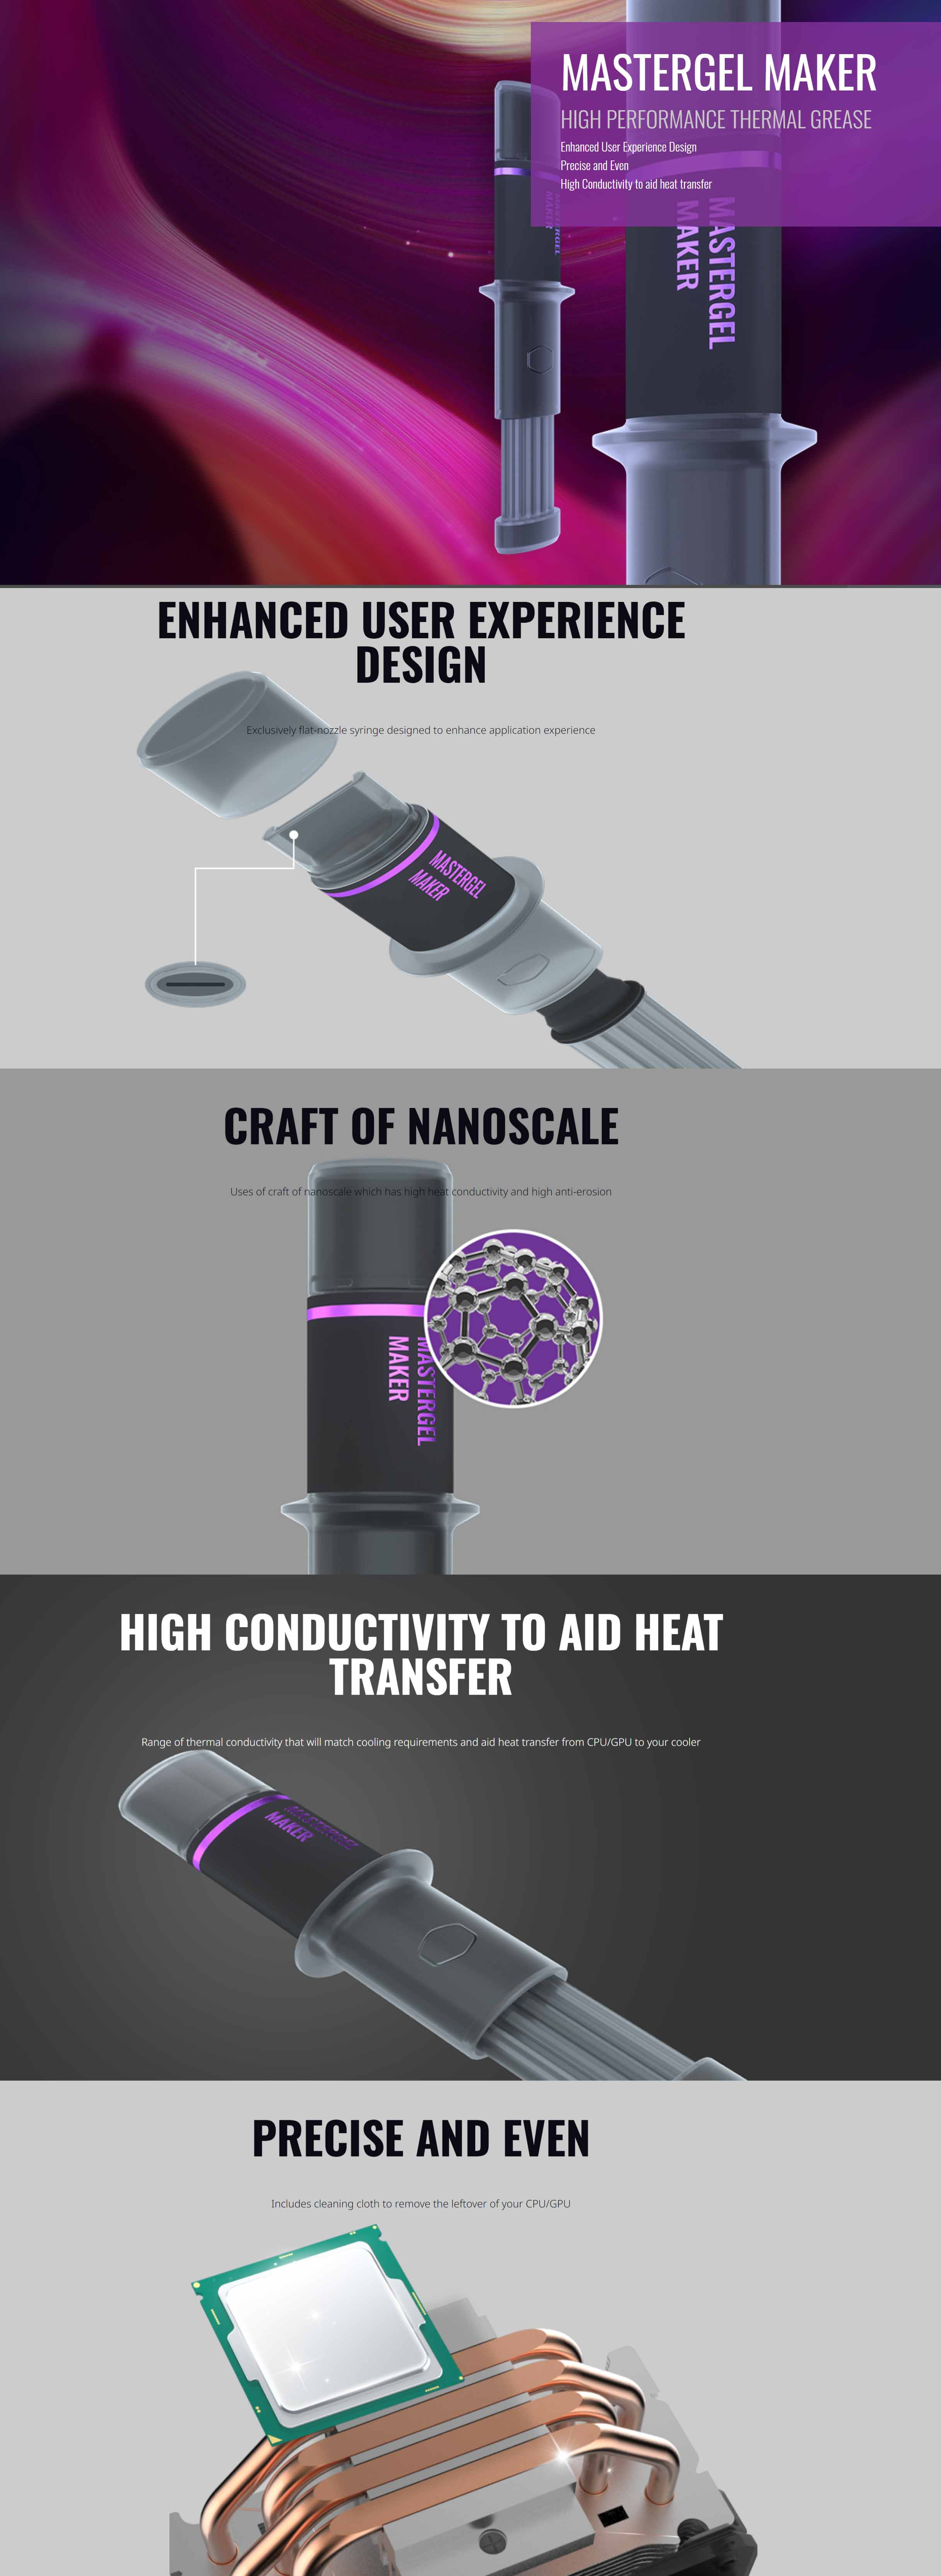 screencapture-coolermaster-catalog-coolers-thermal-grease-new-mastergel-maker-2020-04-30-14_02_46.jpg